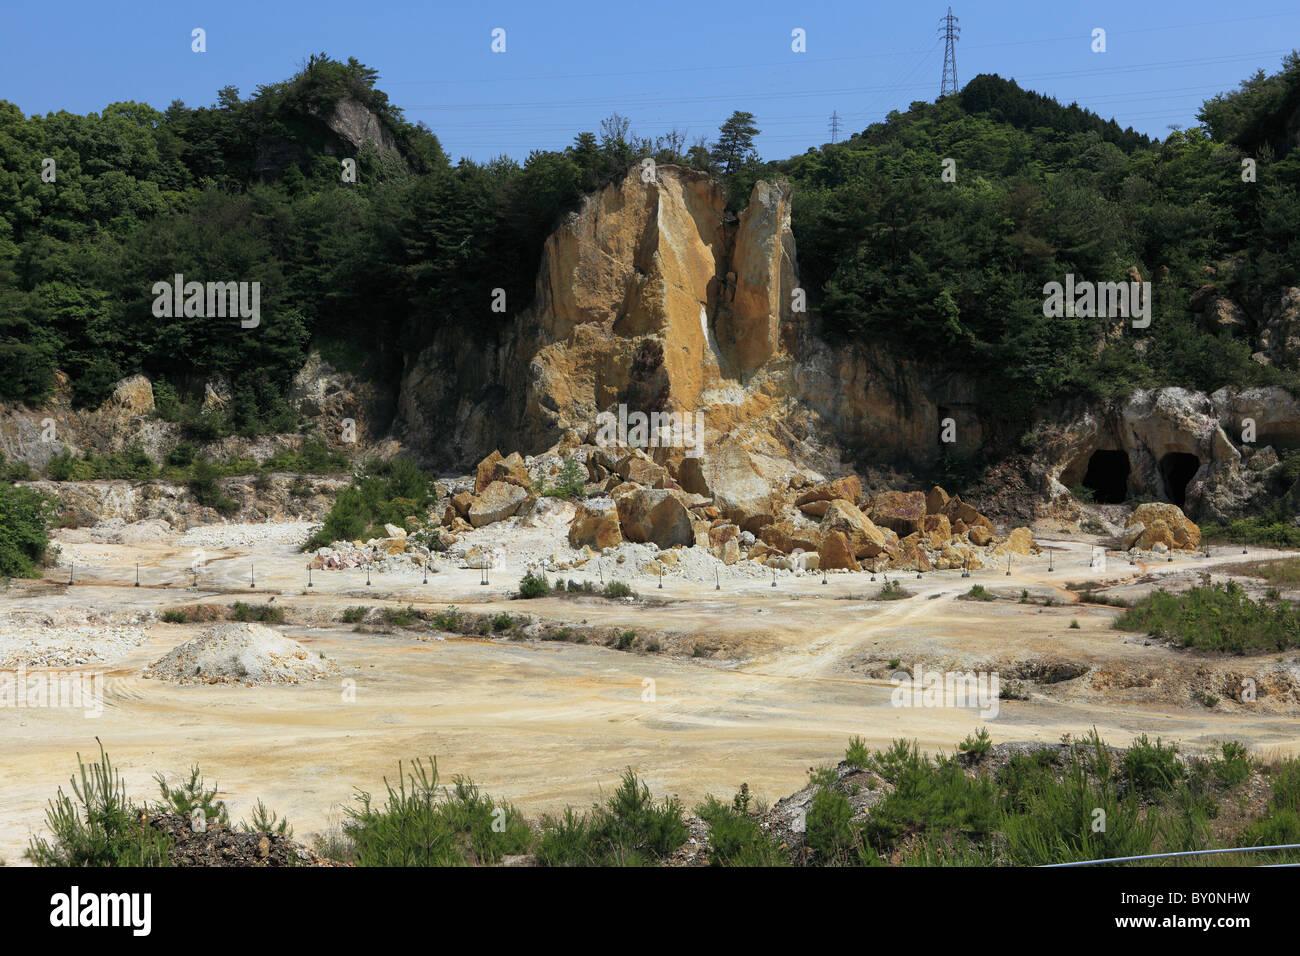 Izumiyama Quarry, Arita, Saga, Japan - Stock Image